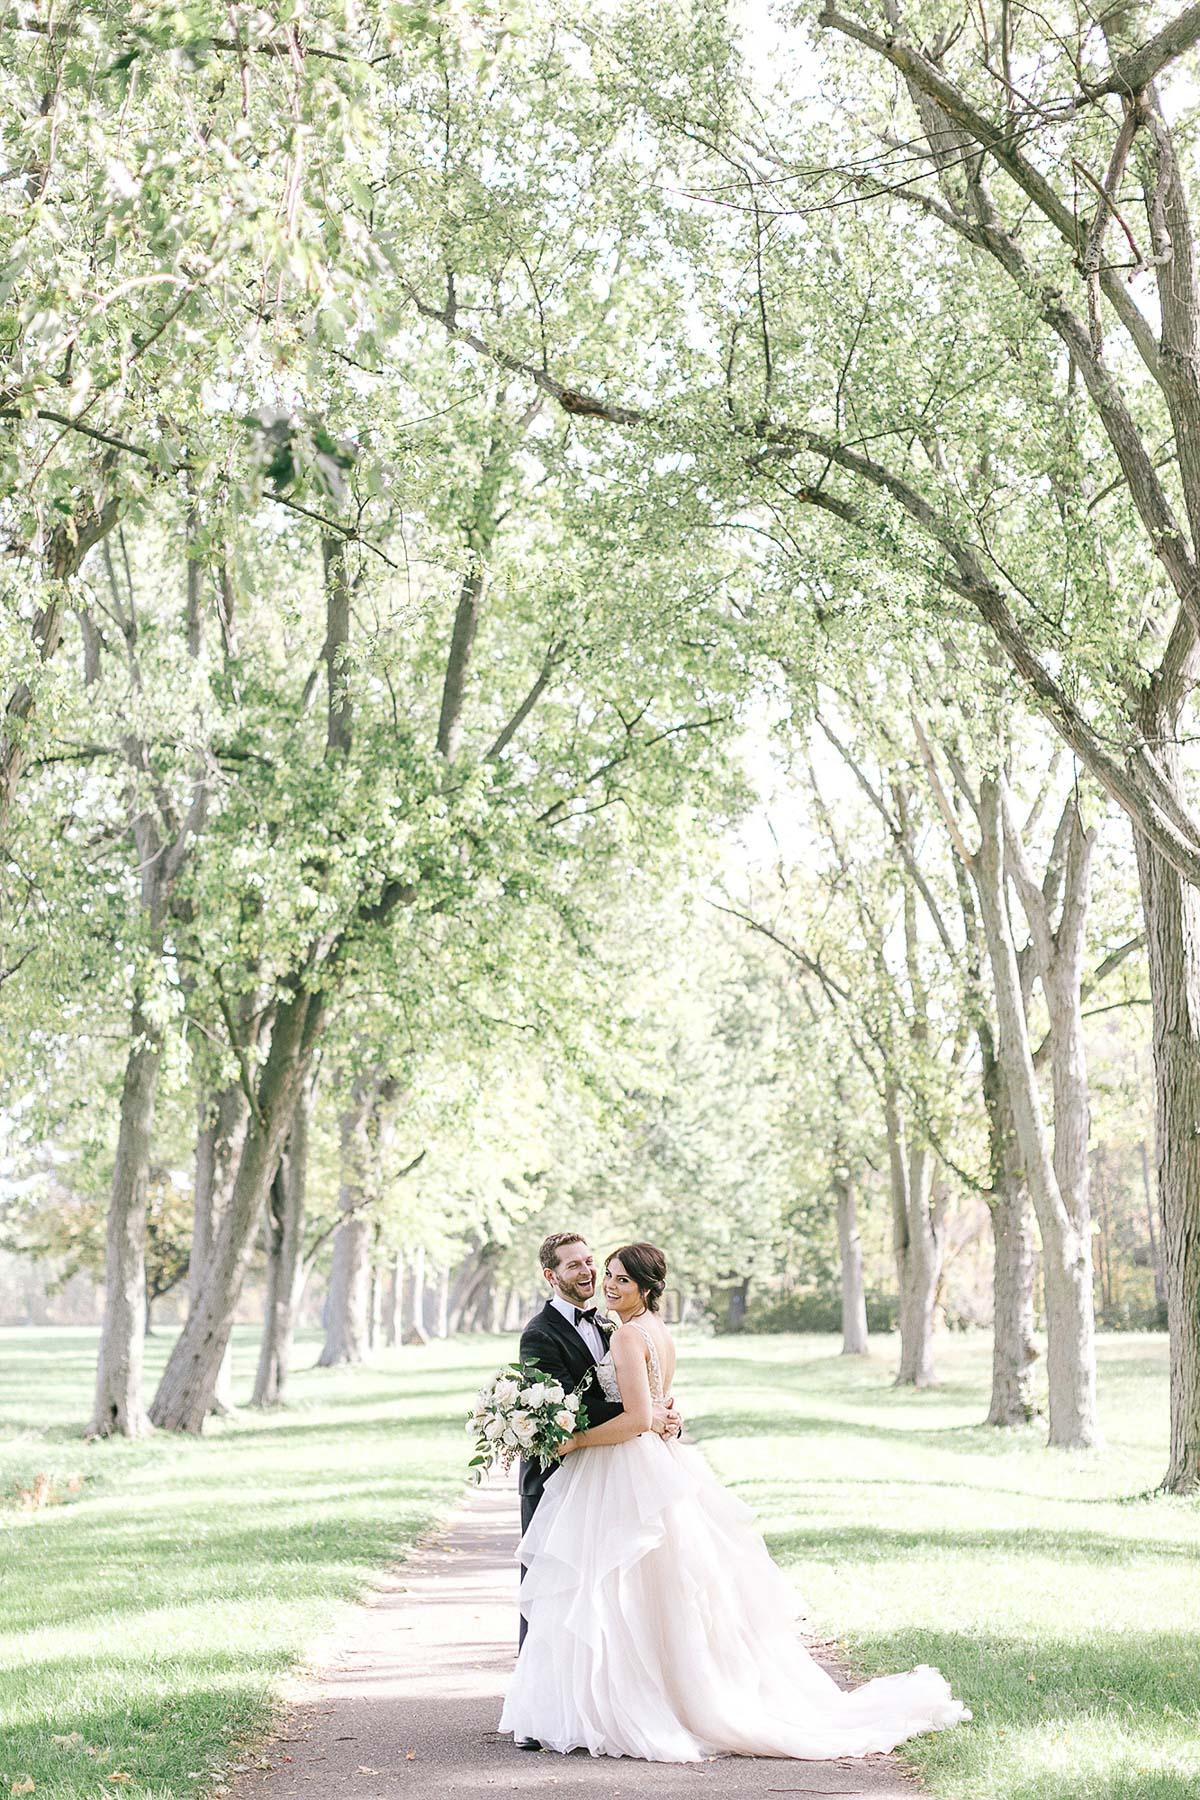 tamara-lockwood-photography-vineyard-bride-swish-list-the-old-courthouse-niagara-on-the-lake-wedding-23.jpg